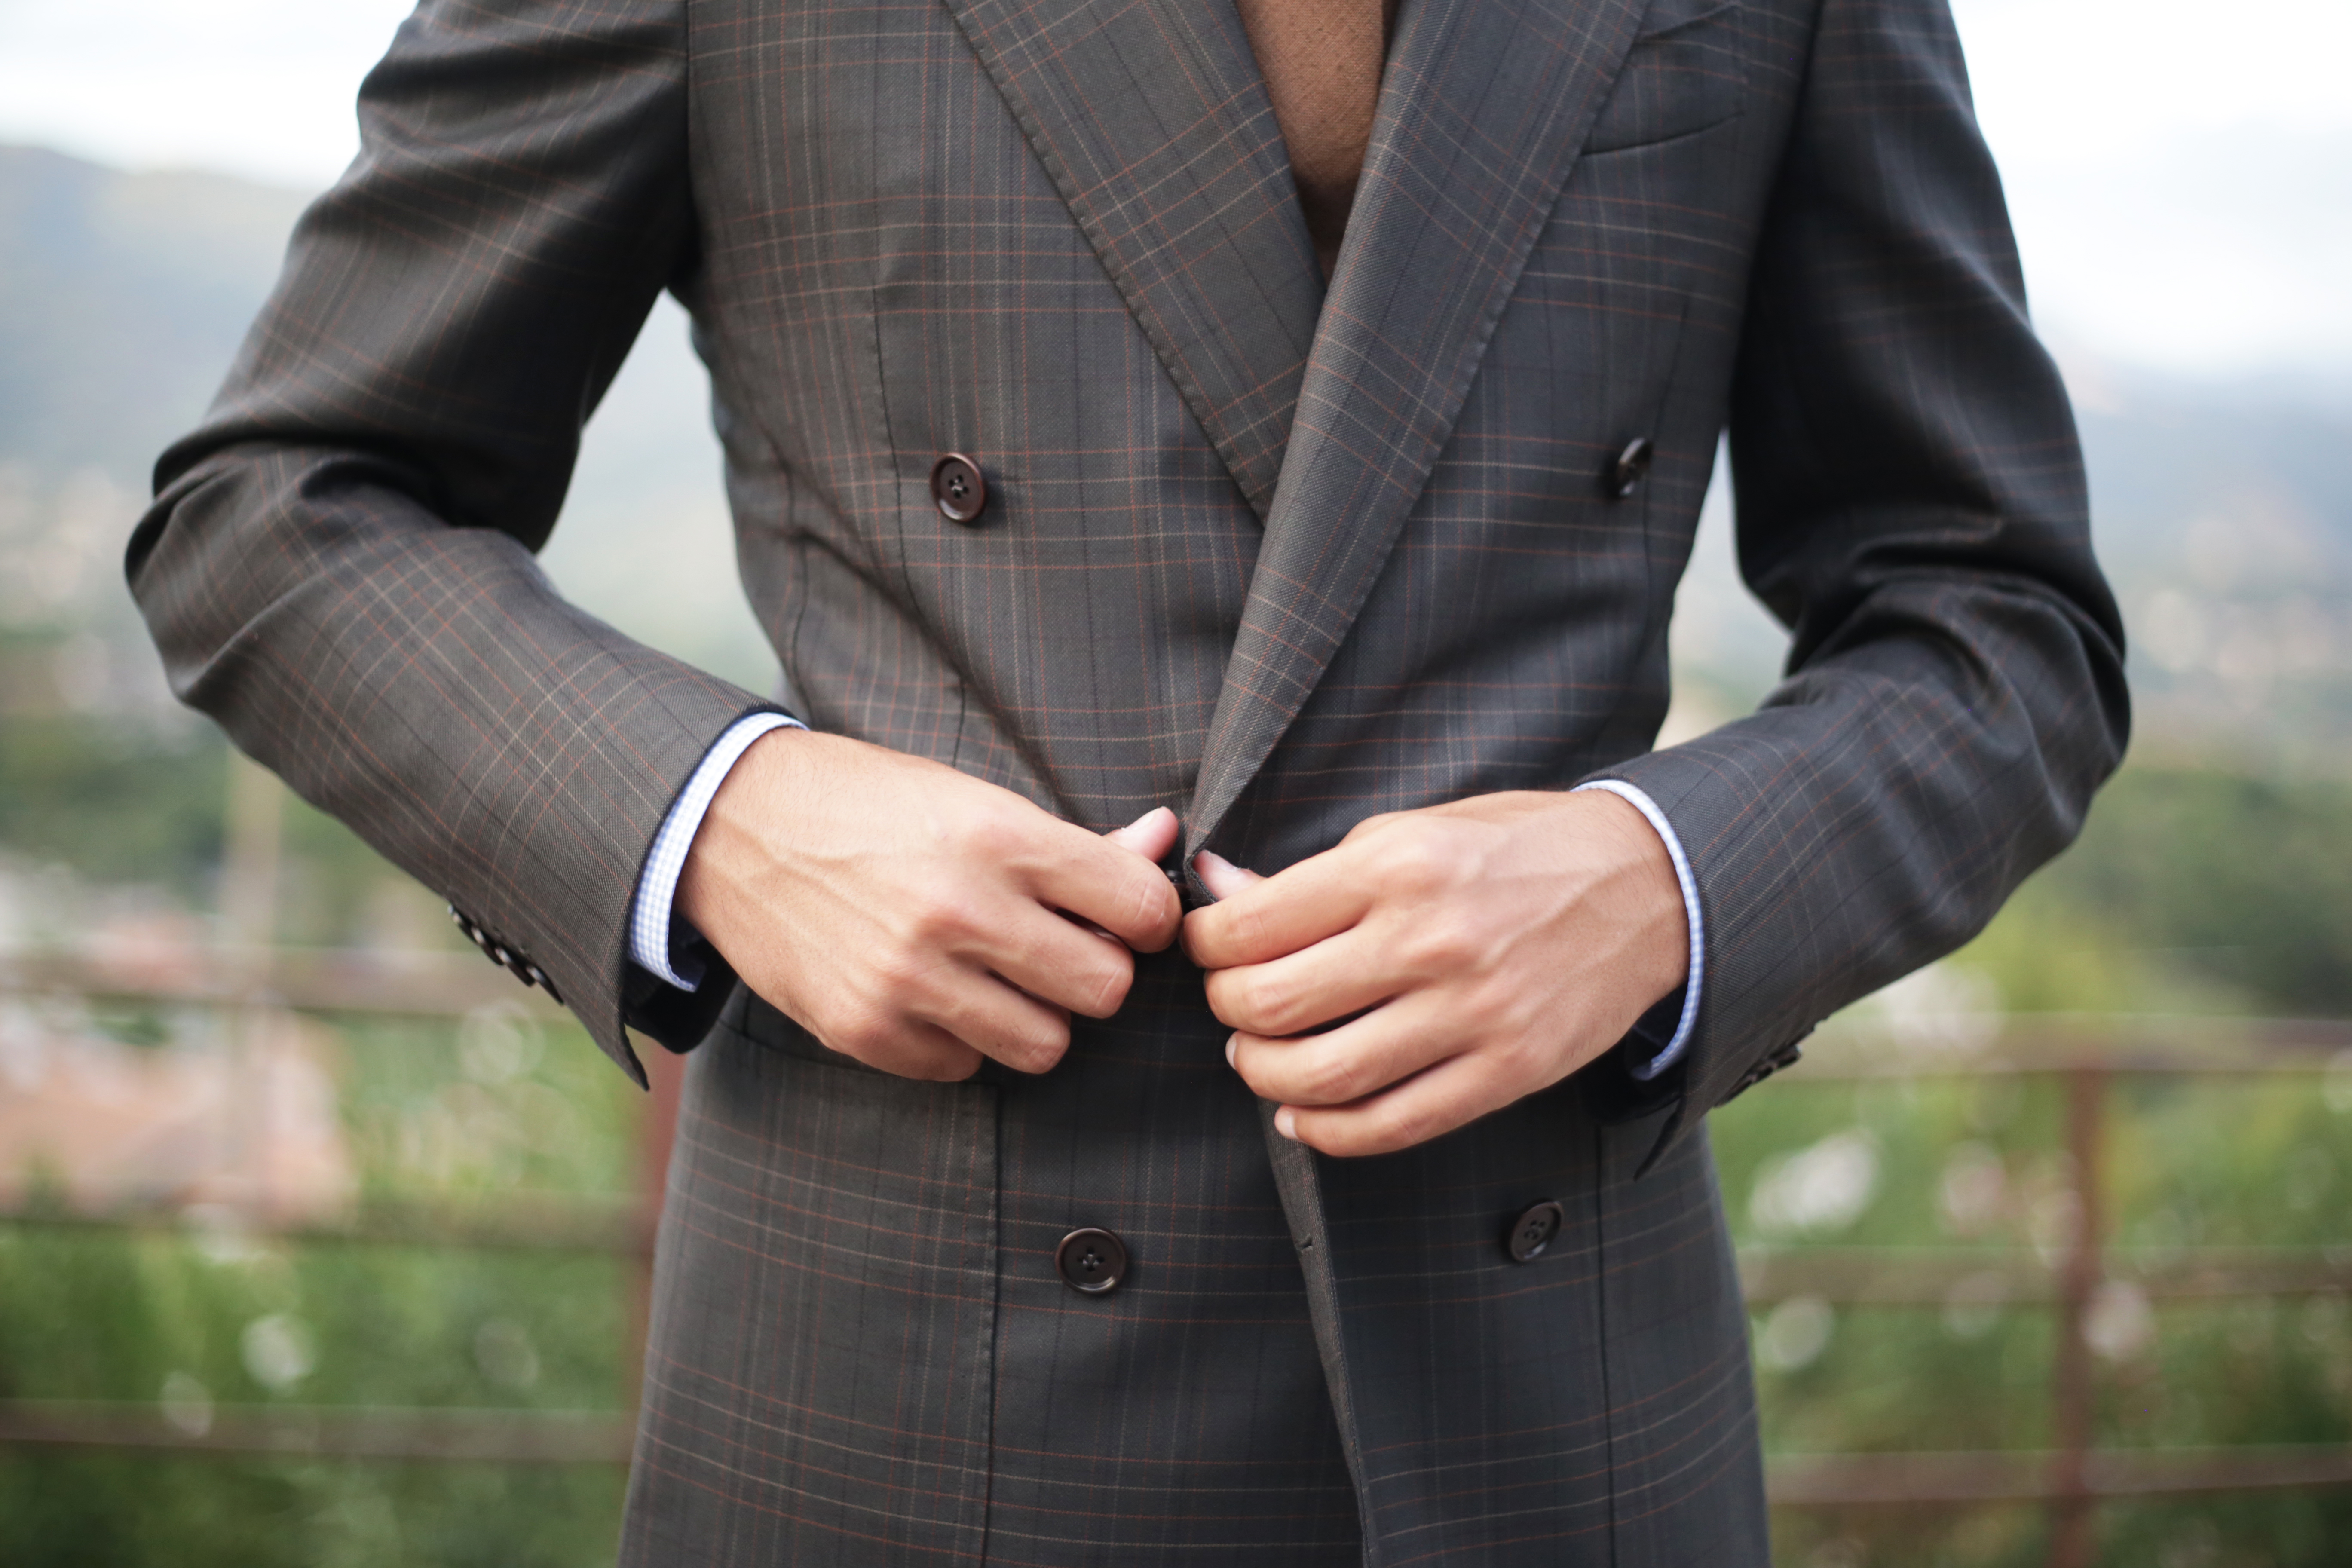 Sartoria Caracciolo bespoke suit made with Huddersfield Textiles fabric.